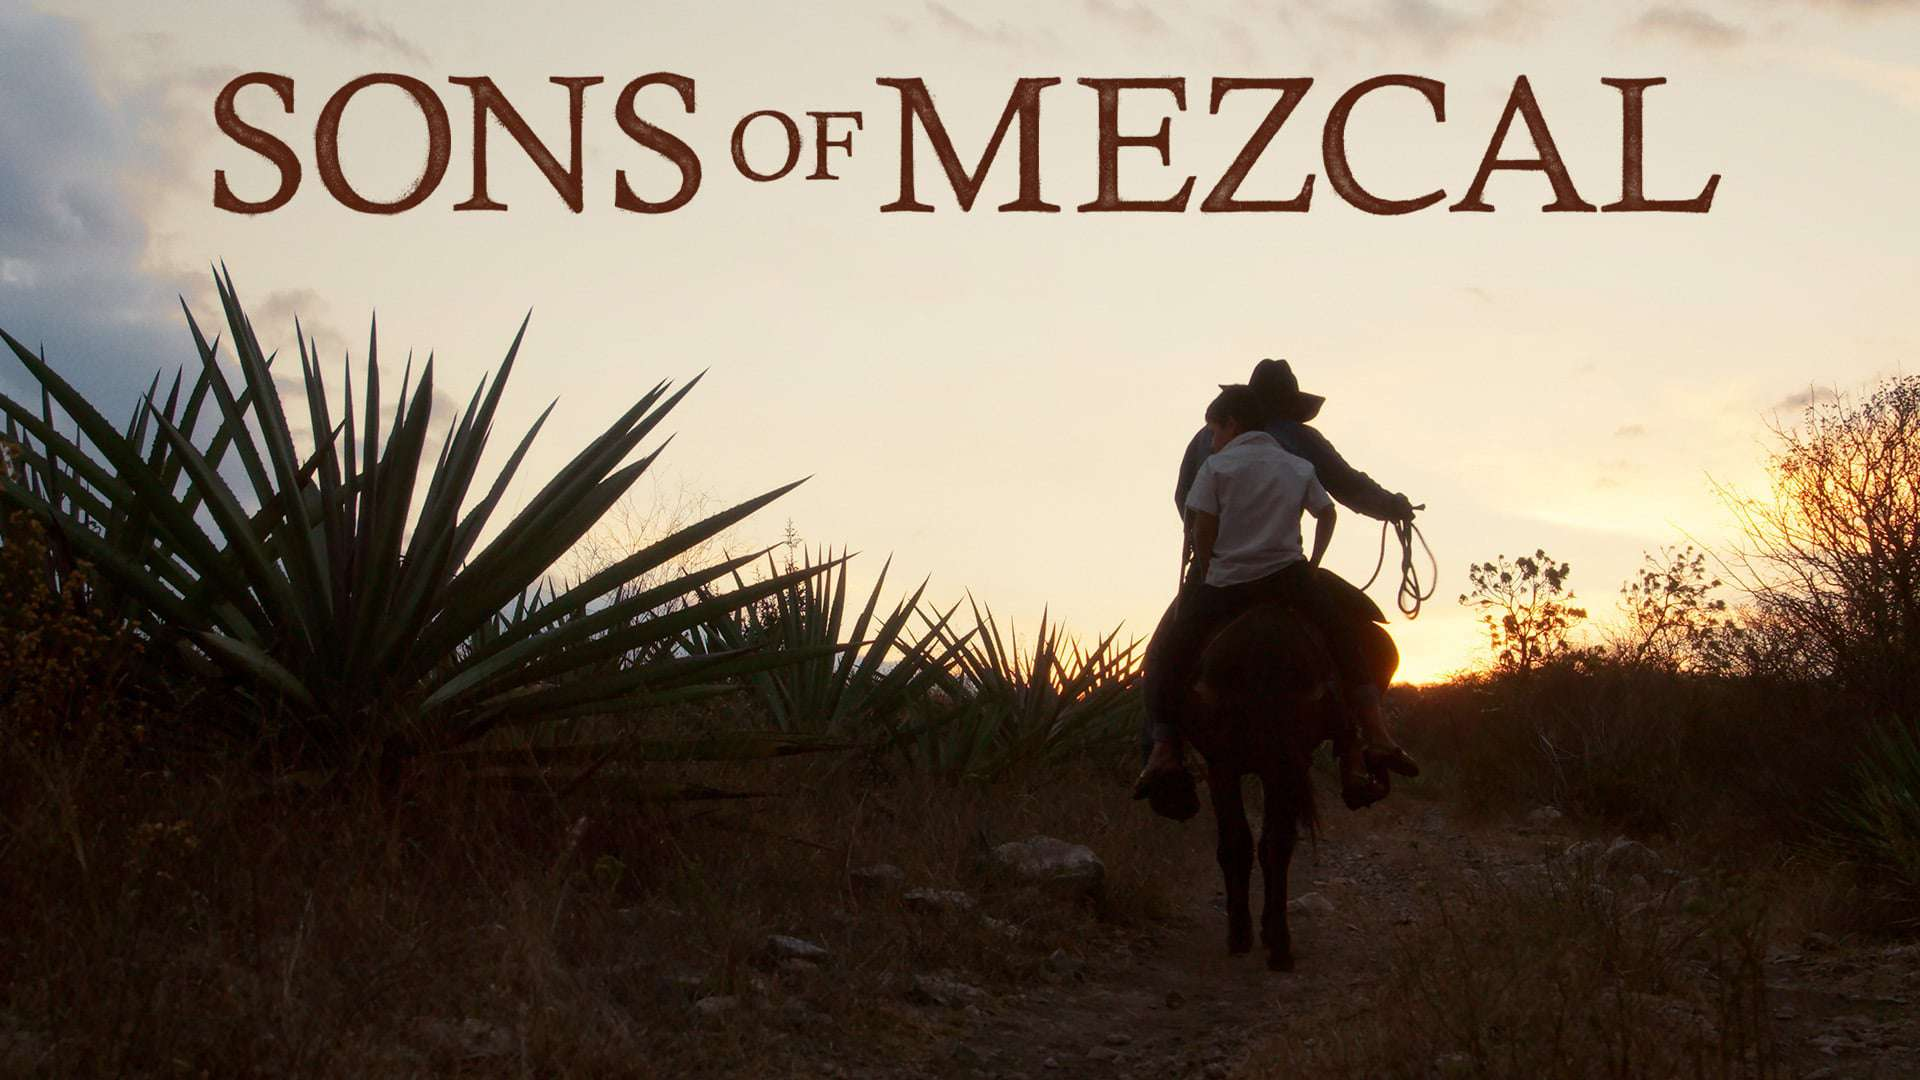 Sons of Mezcal